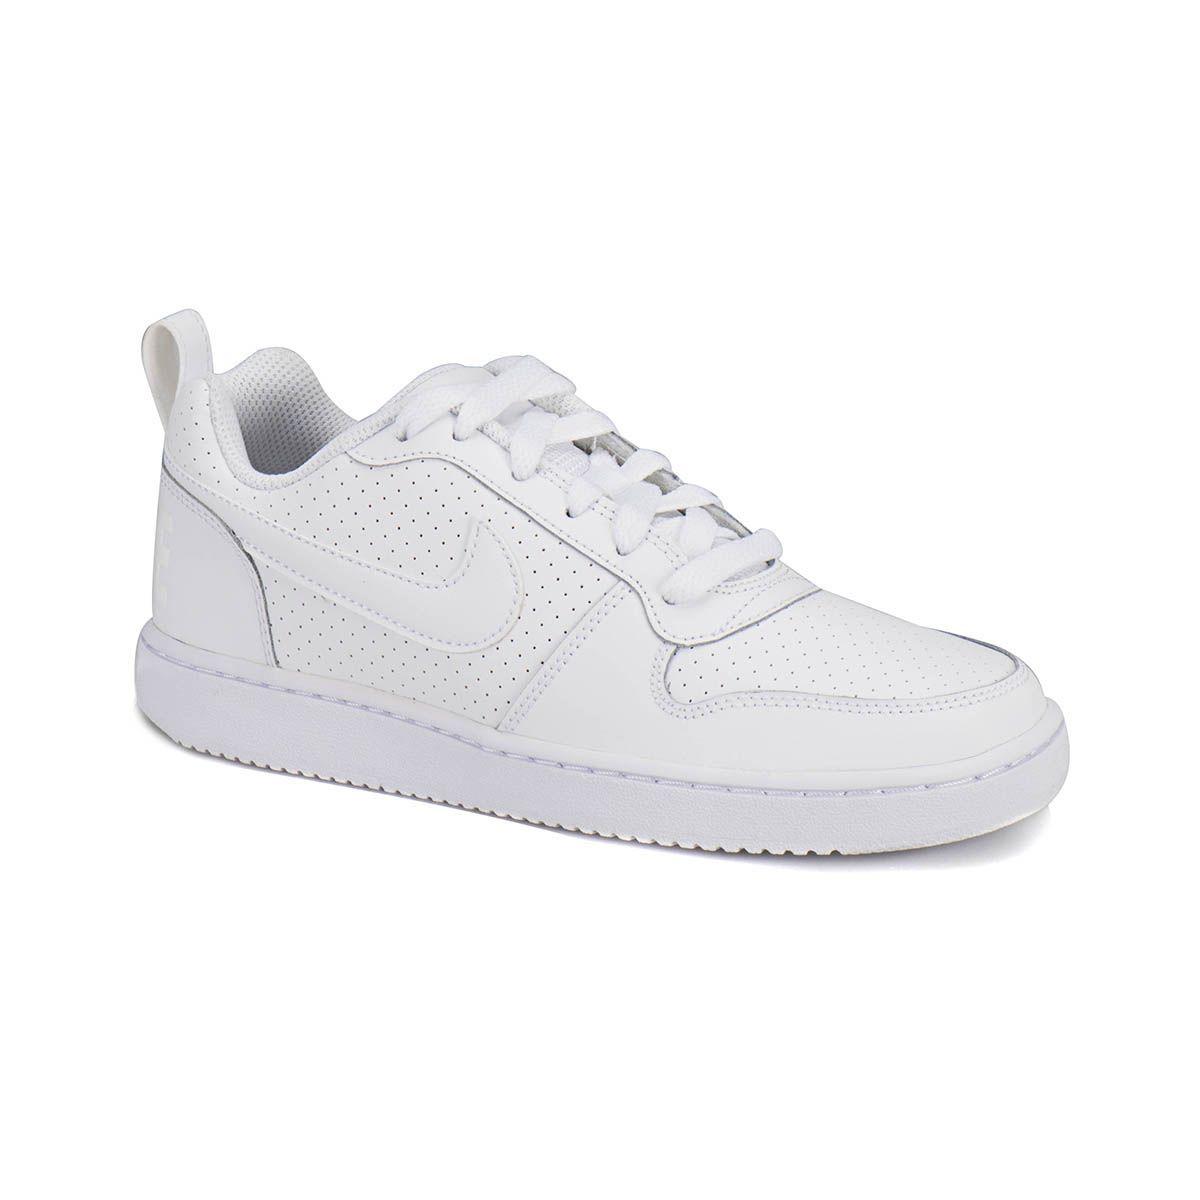 Flo Nike Wmns Court Borough Low Beyaz Kadin Sneaker Flo Ayakkabi Nike Sneaker Kadin